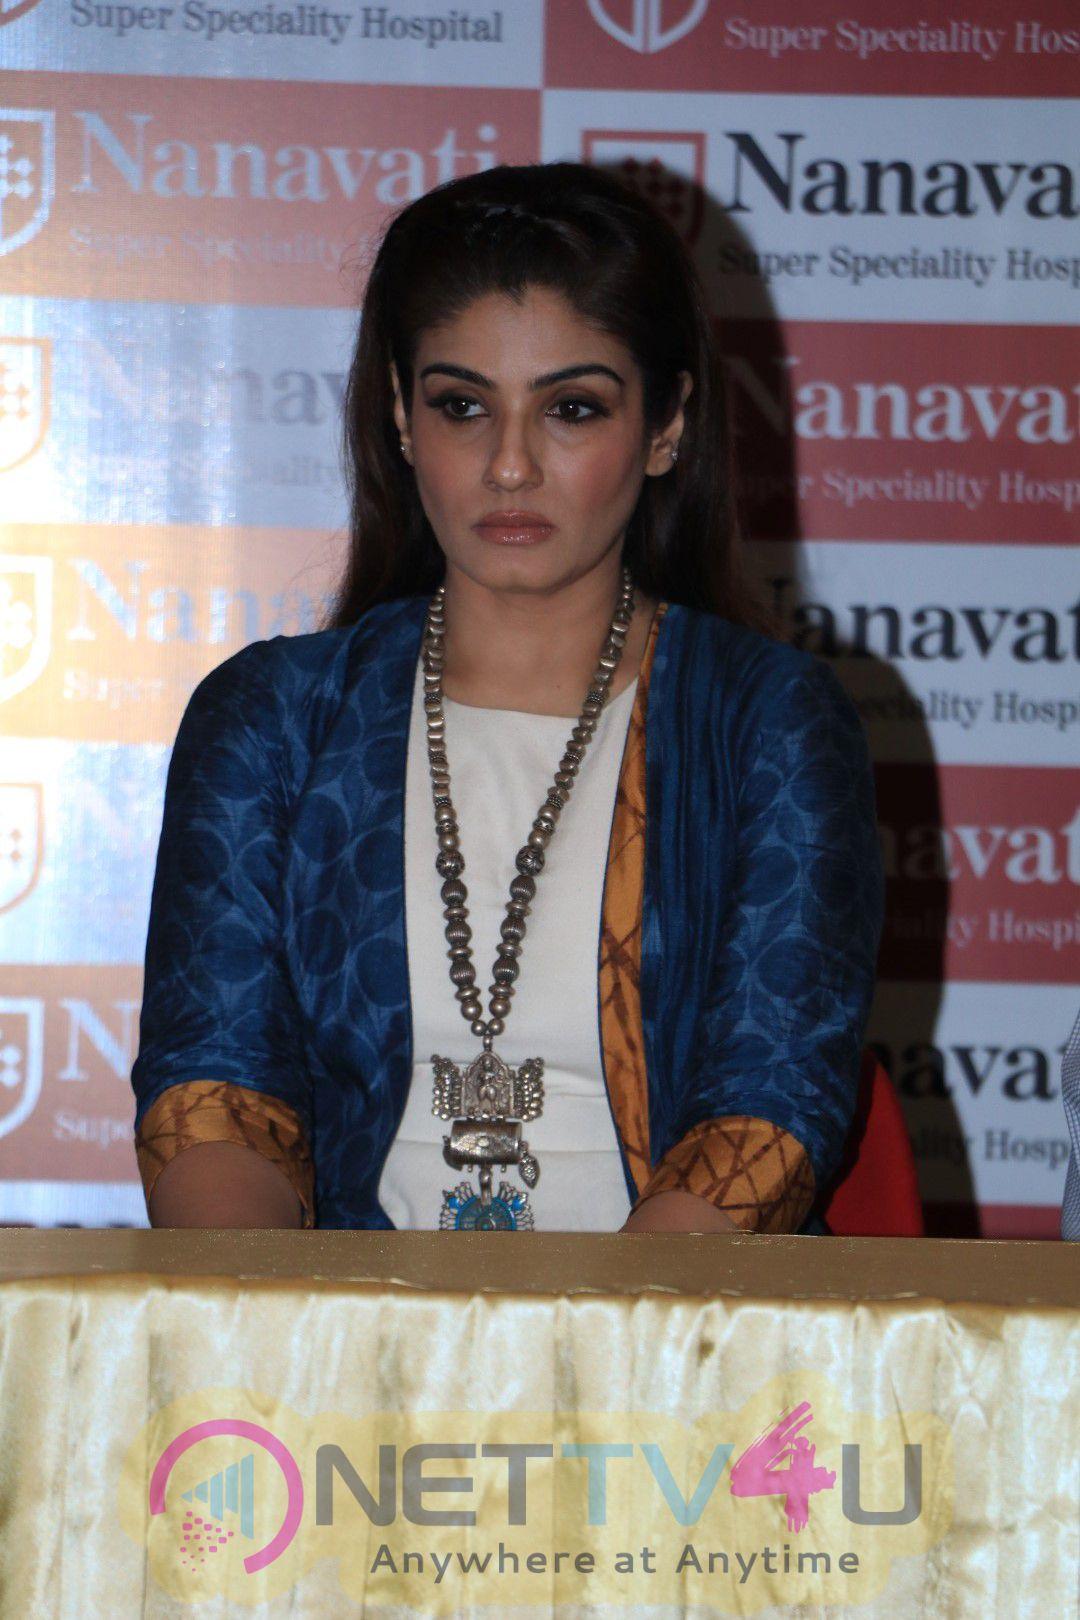 Raveena Tandon Announced As The Brand Ambassador Of Nanavati Super Speciality Hospital Stills